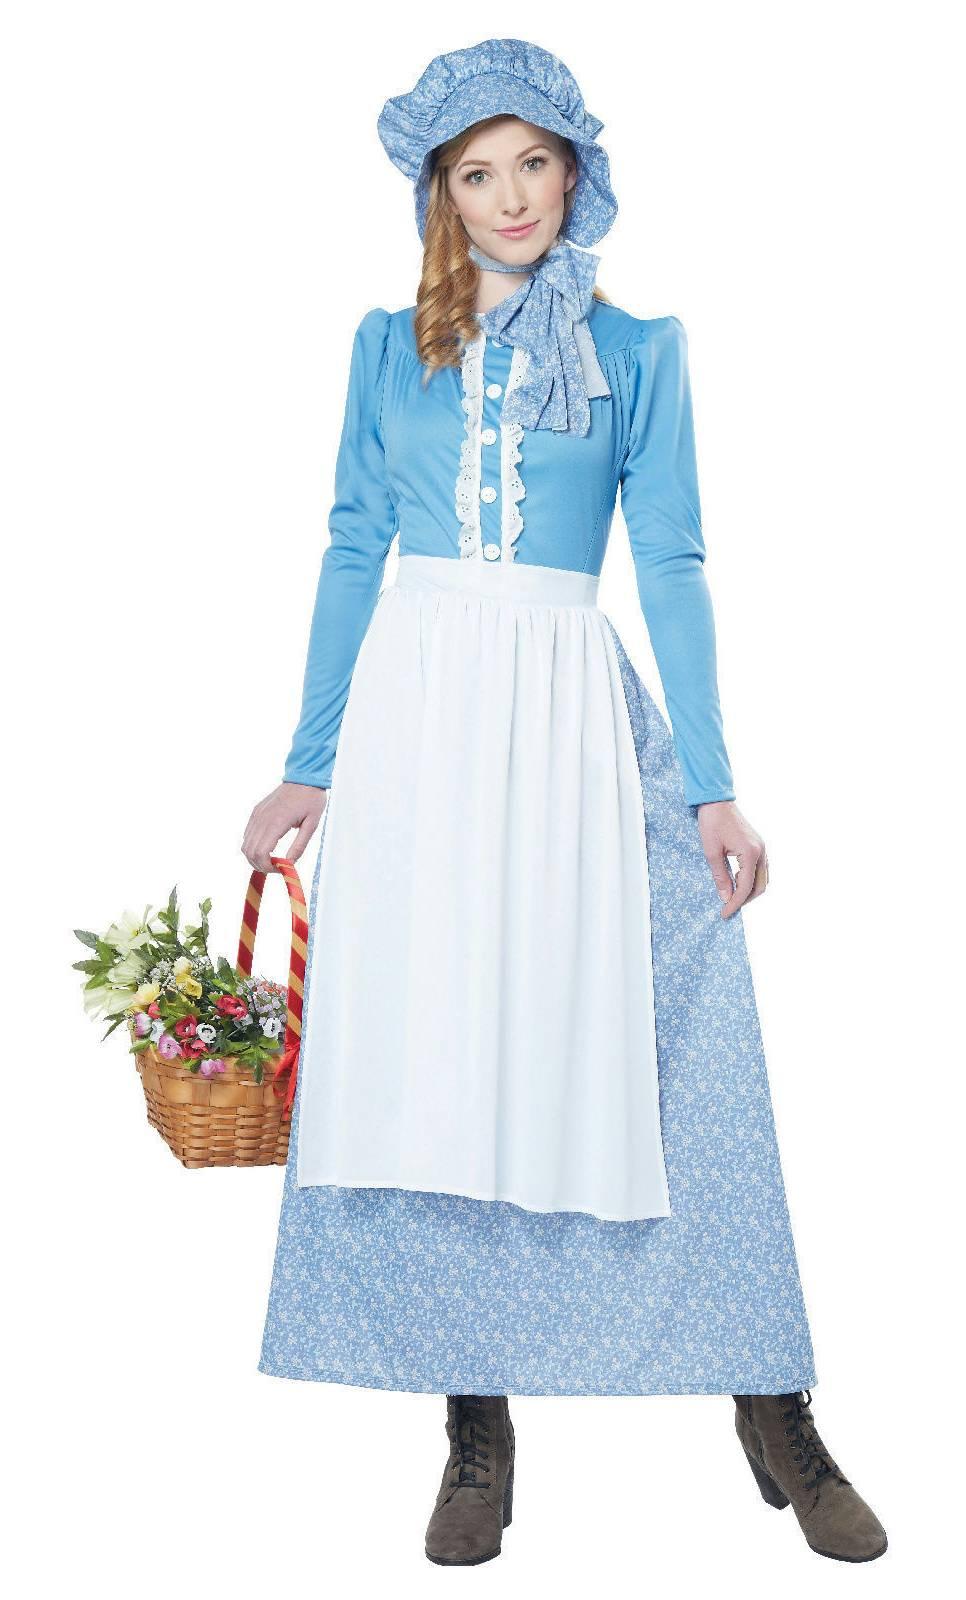 costume femme prairie w20225